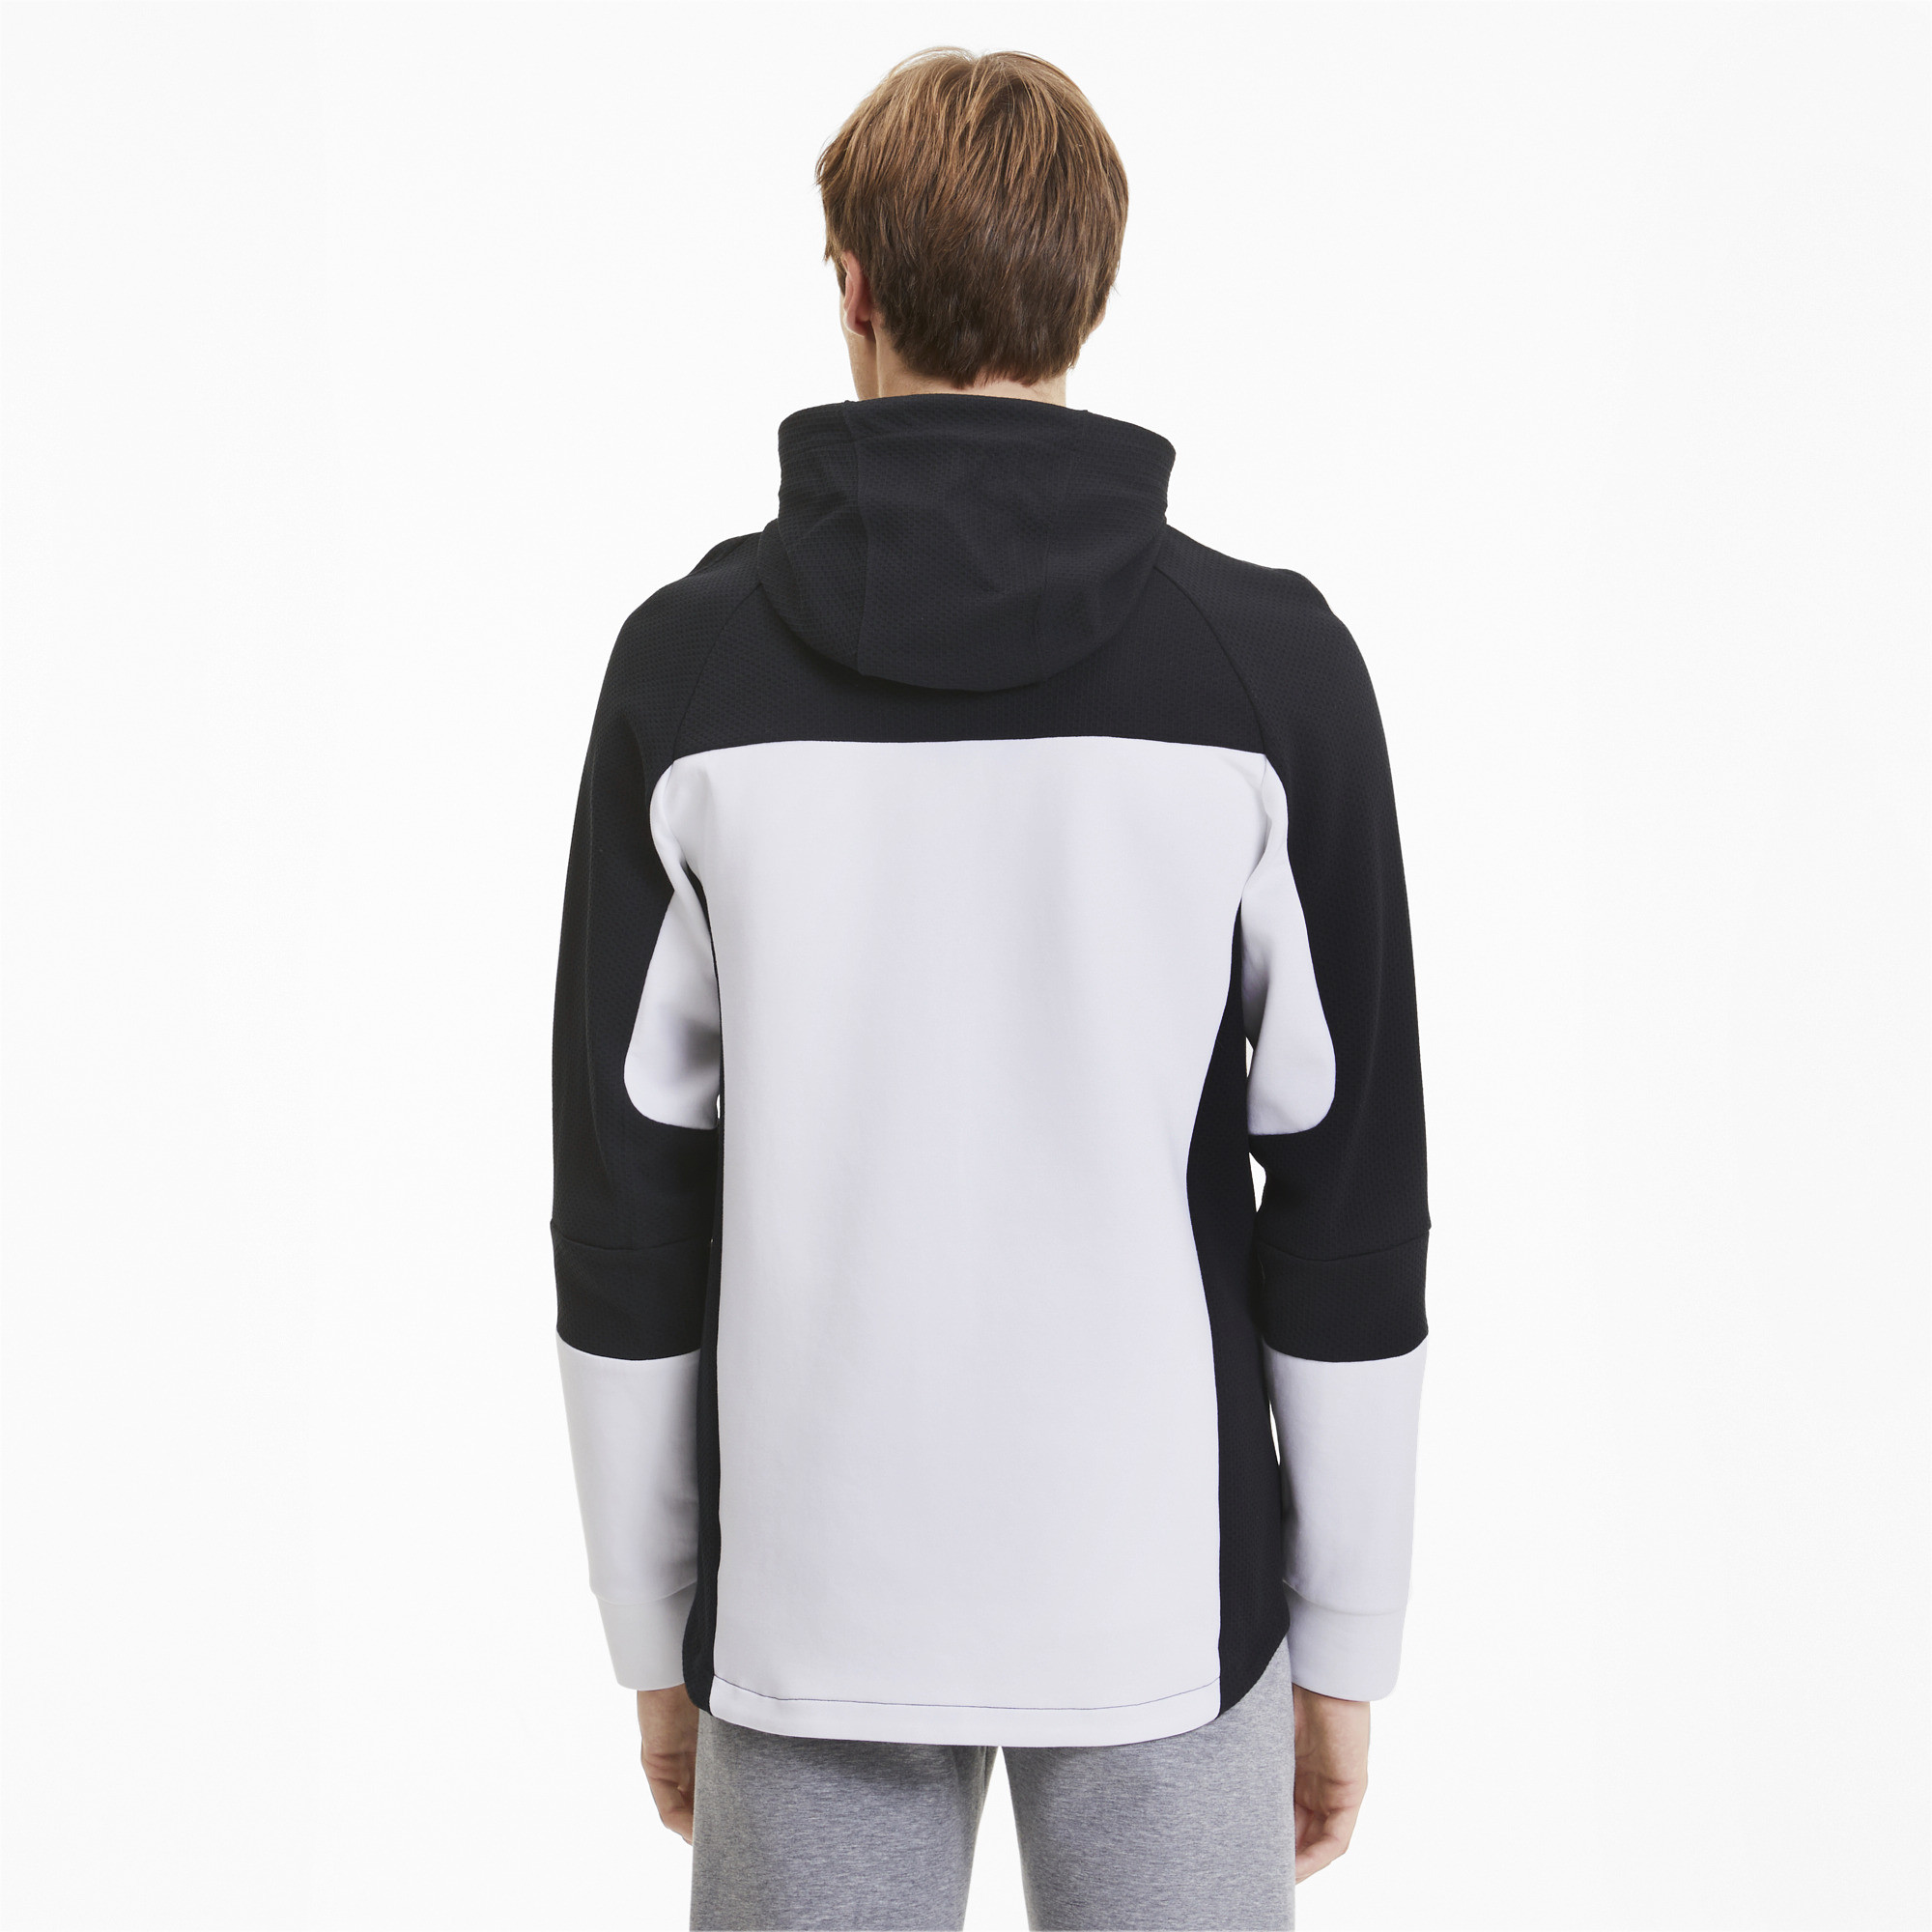 PUMA-Evostripe-Men-039-s-Hooded-Jacket-Men-Sweat-Basics thumbnail 10